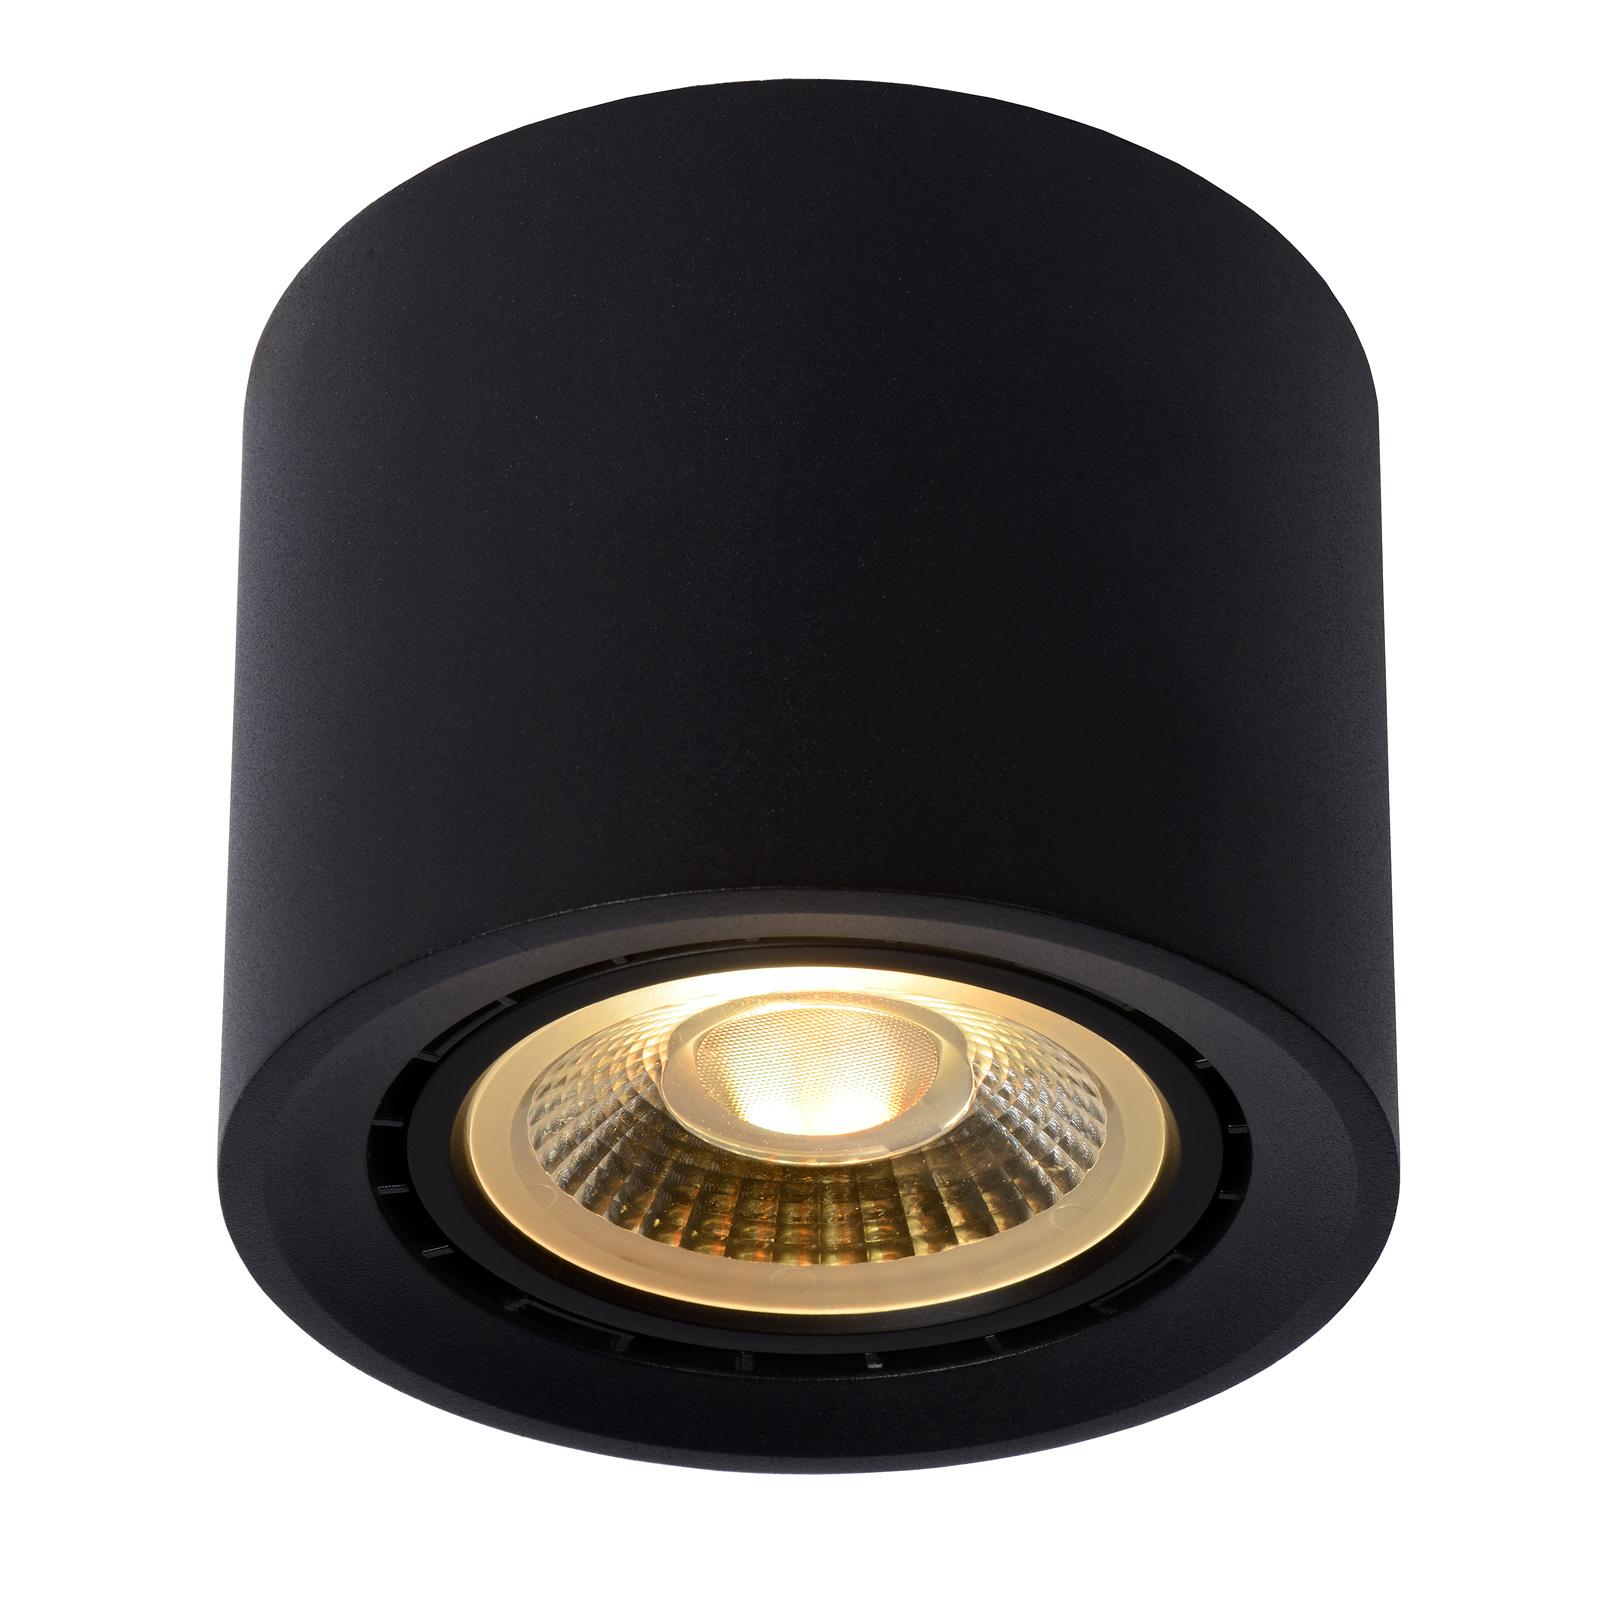 LED-kattovalaisin Fedler dim to warm, musta